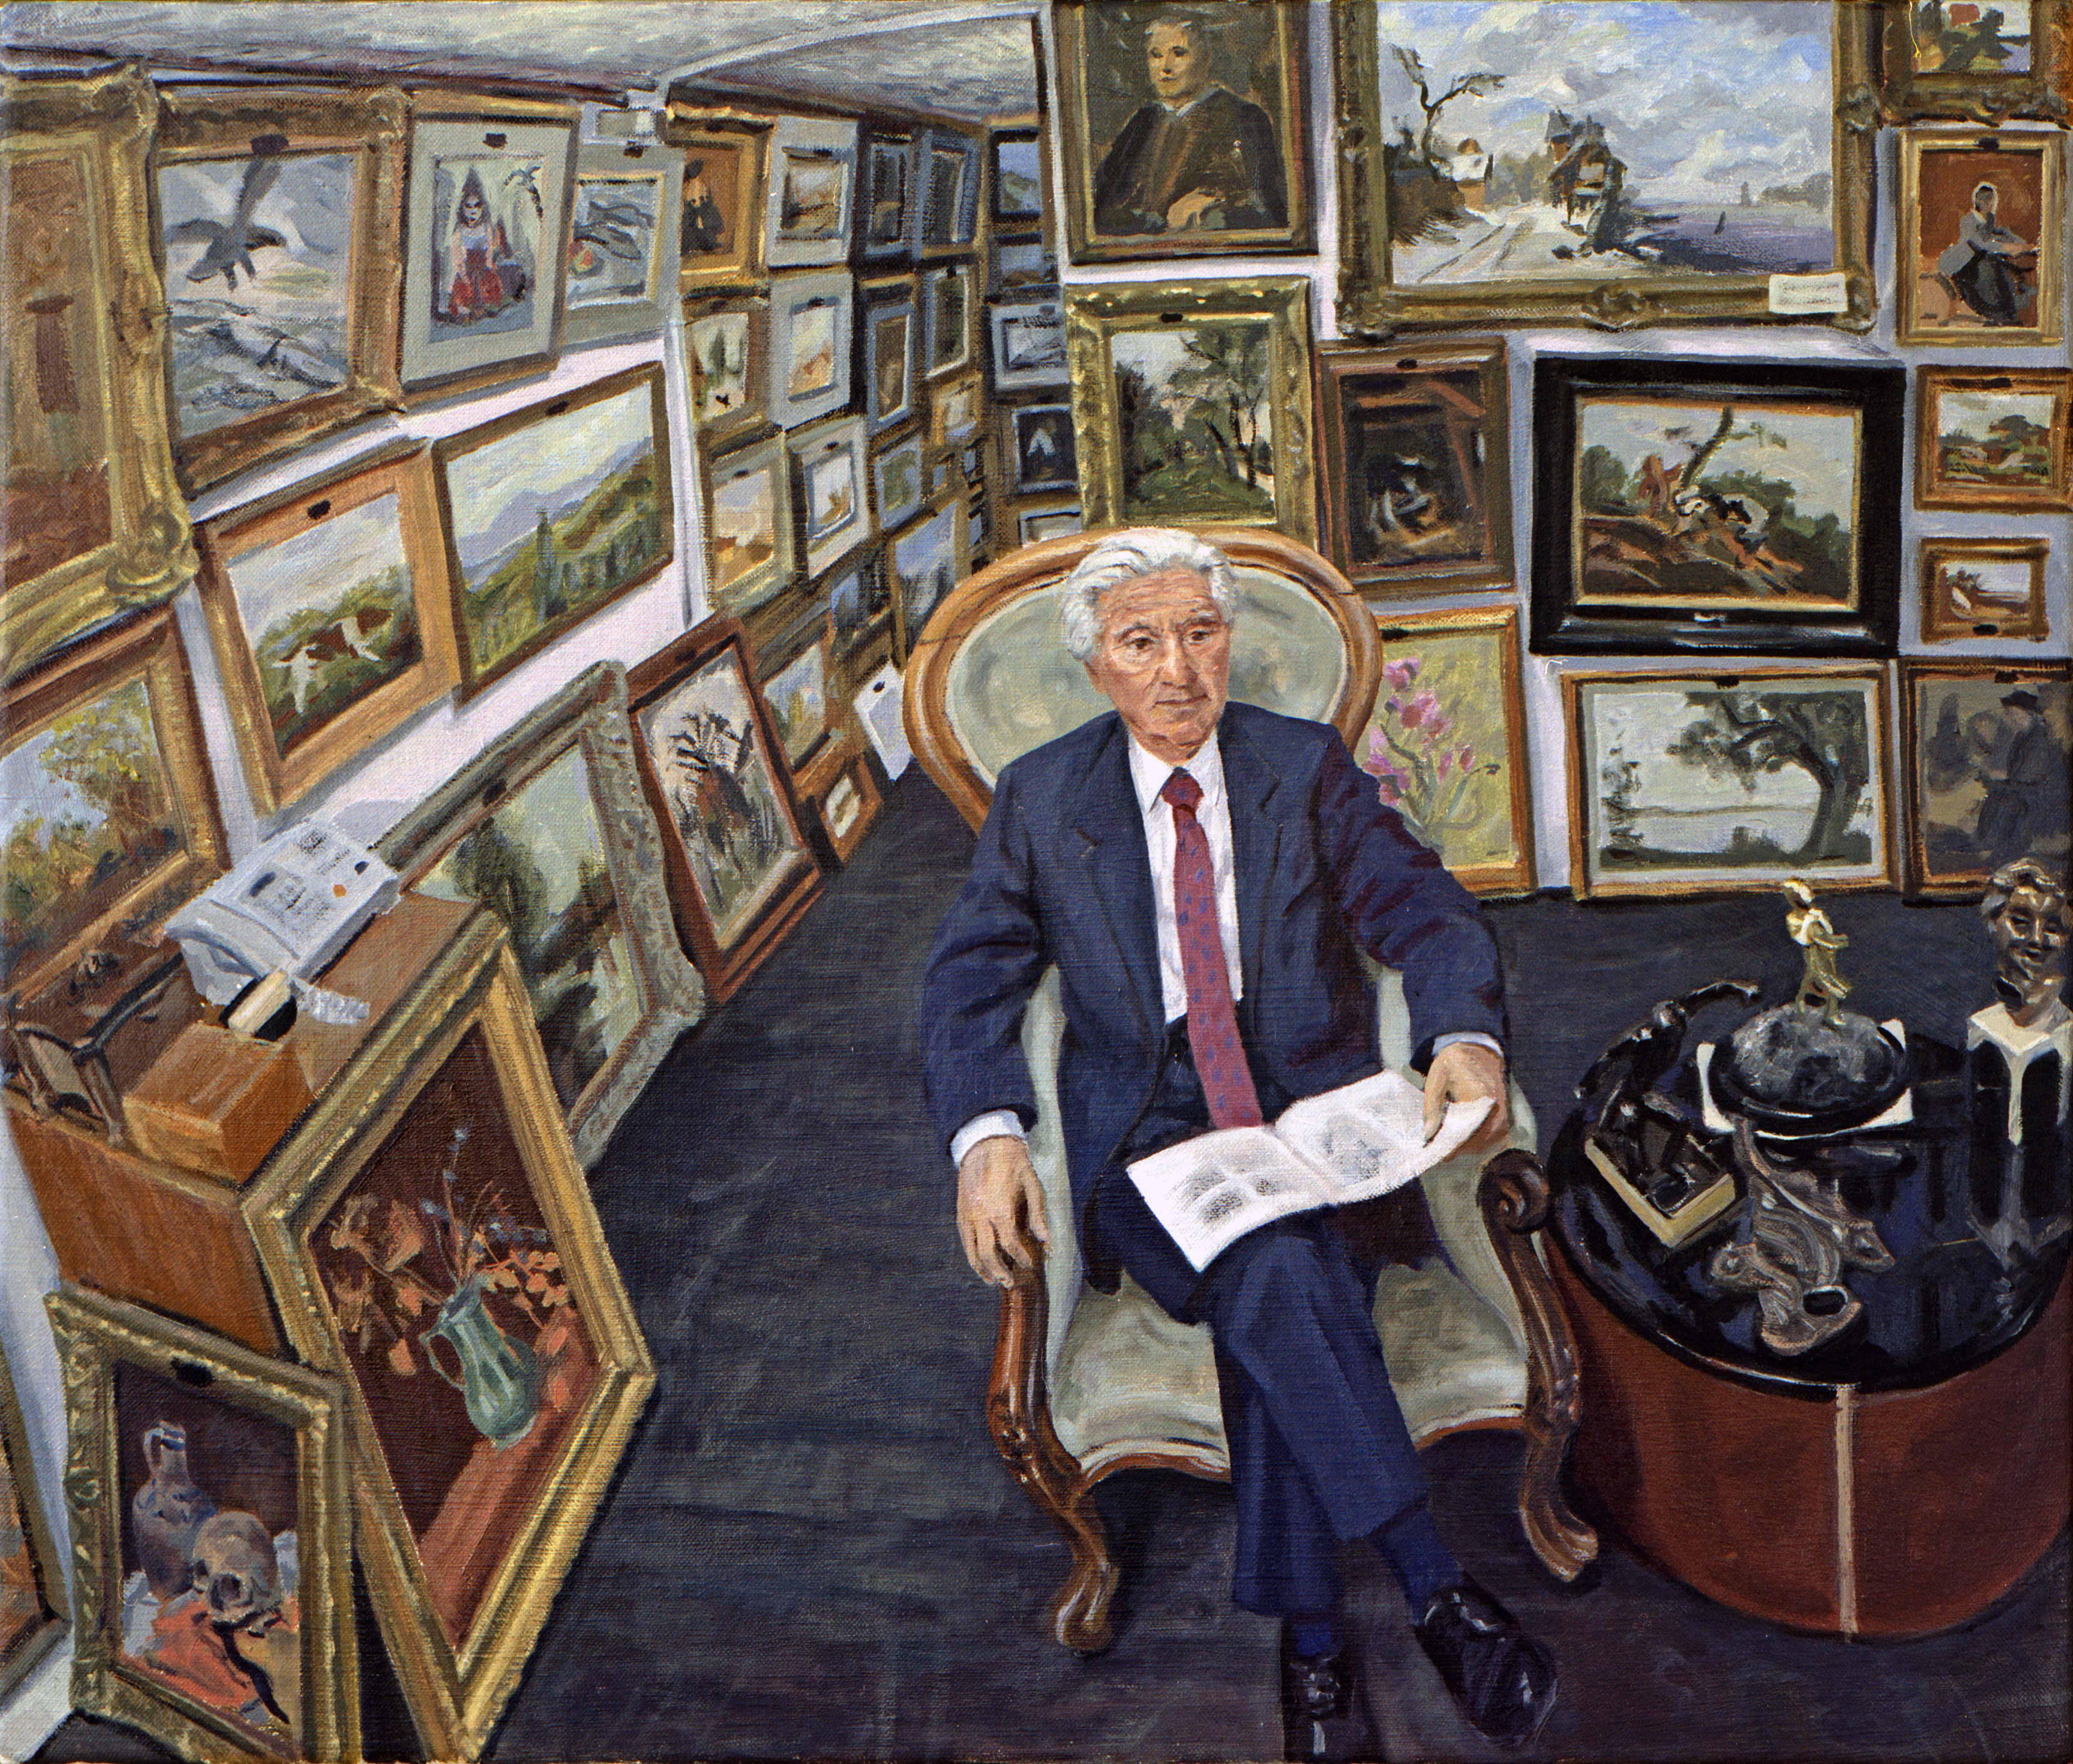 In opdracht: kunsthandelaar Knoop 2001